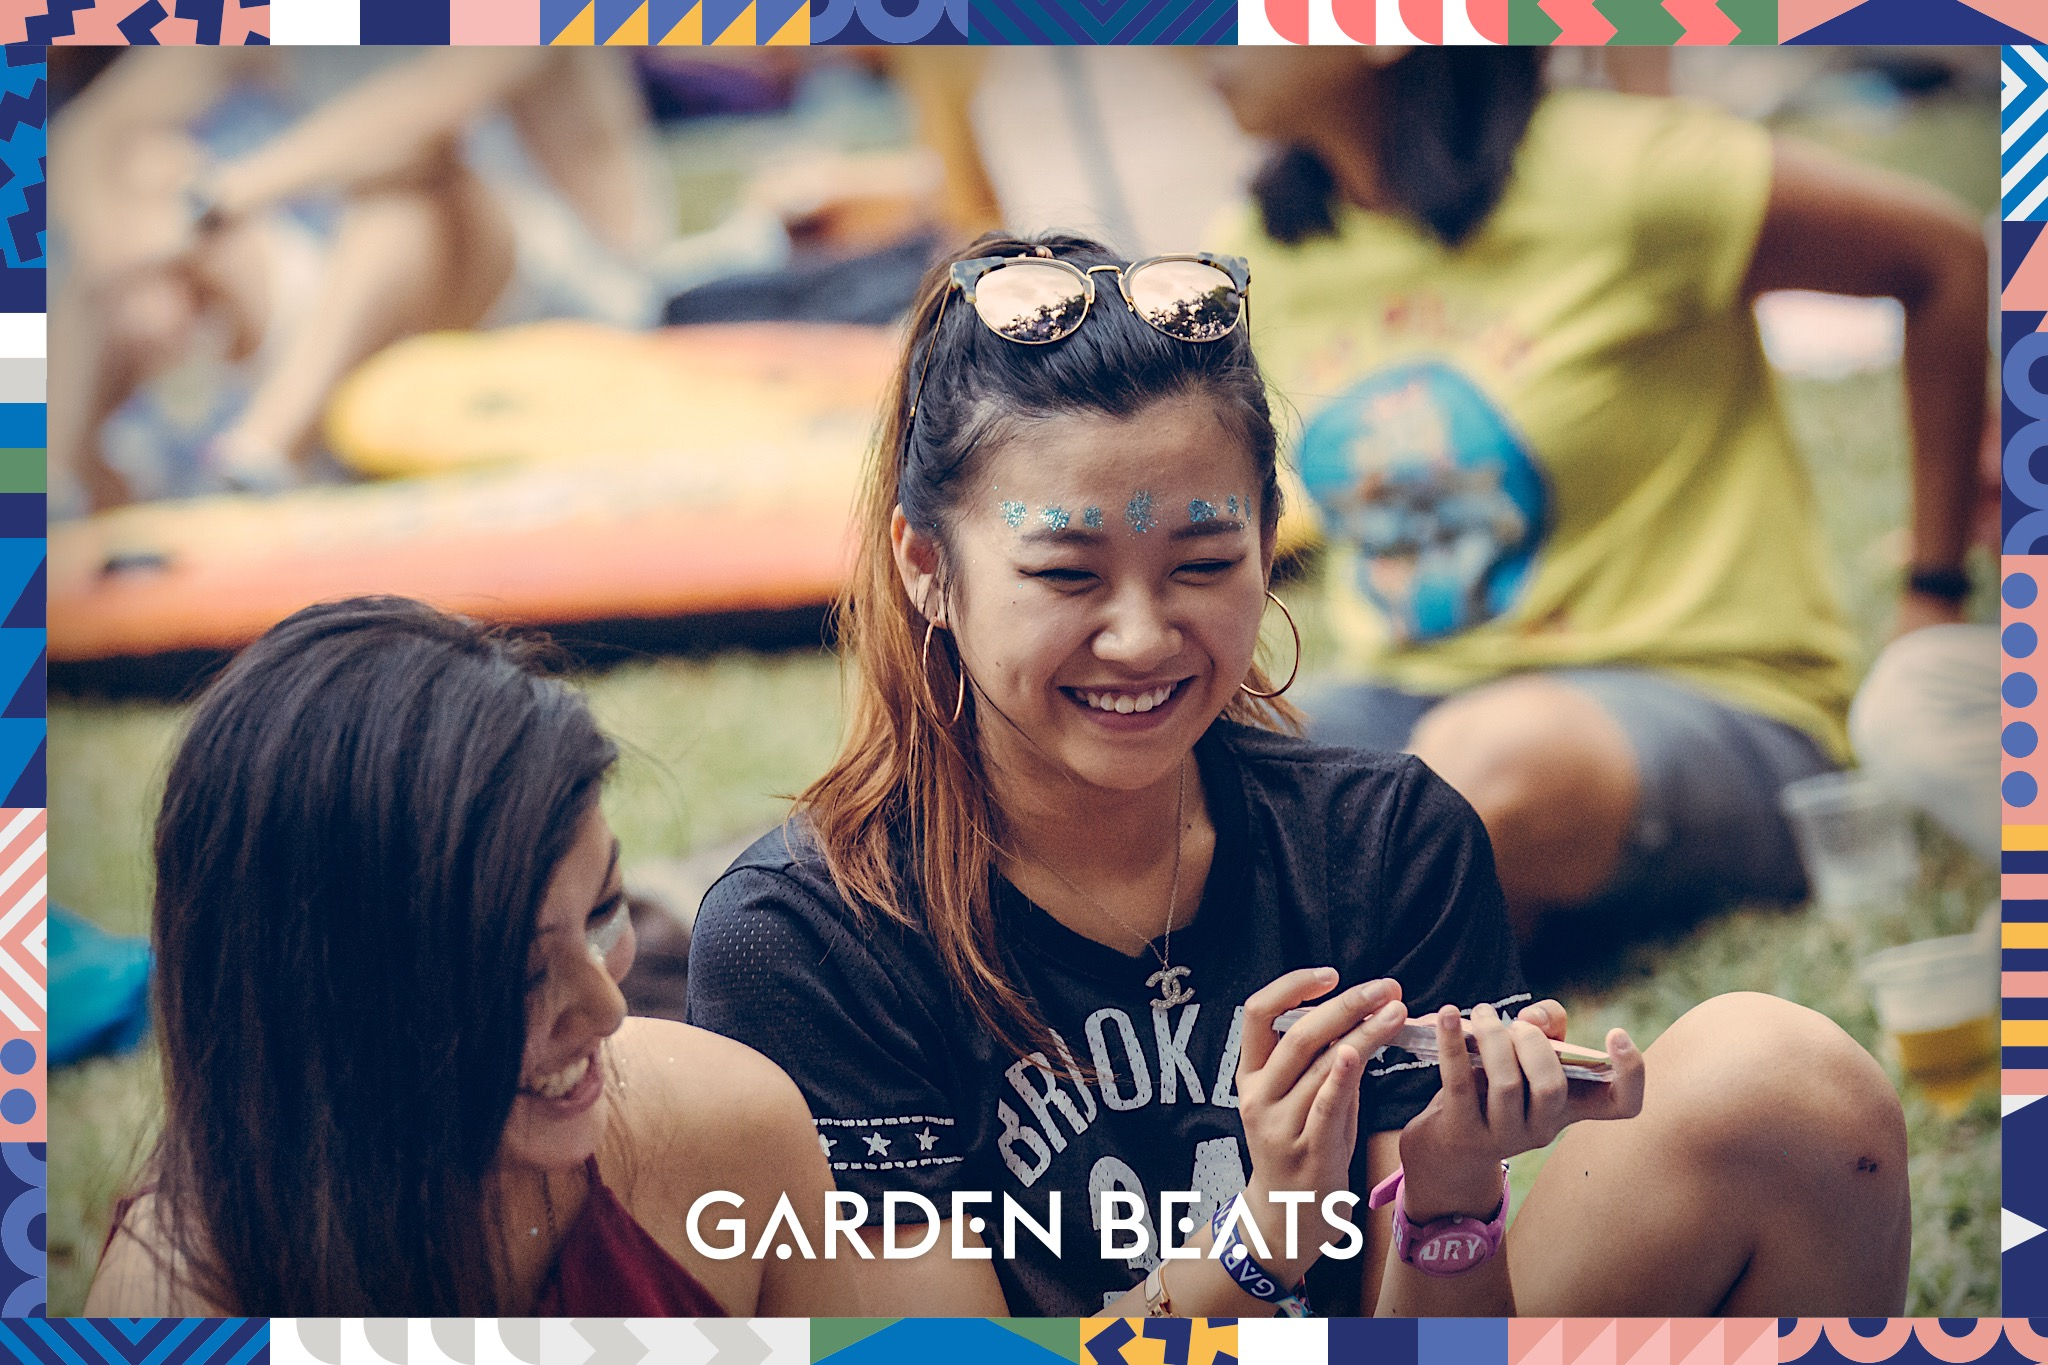 03032018_GardenBeats_Colossal461_Watermarked.jpg